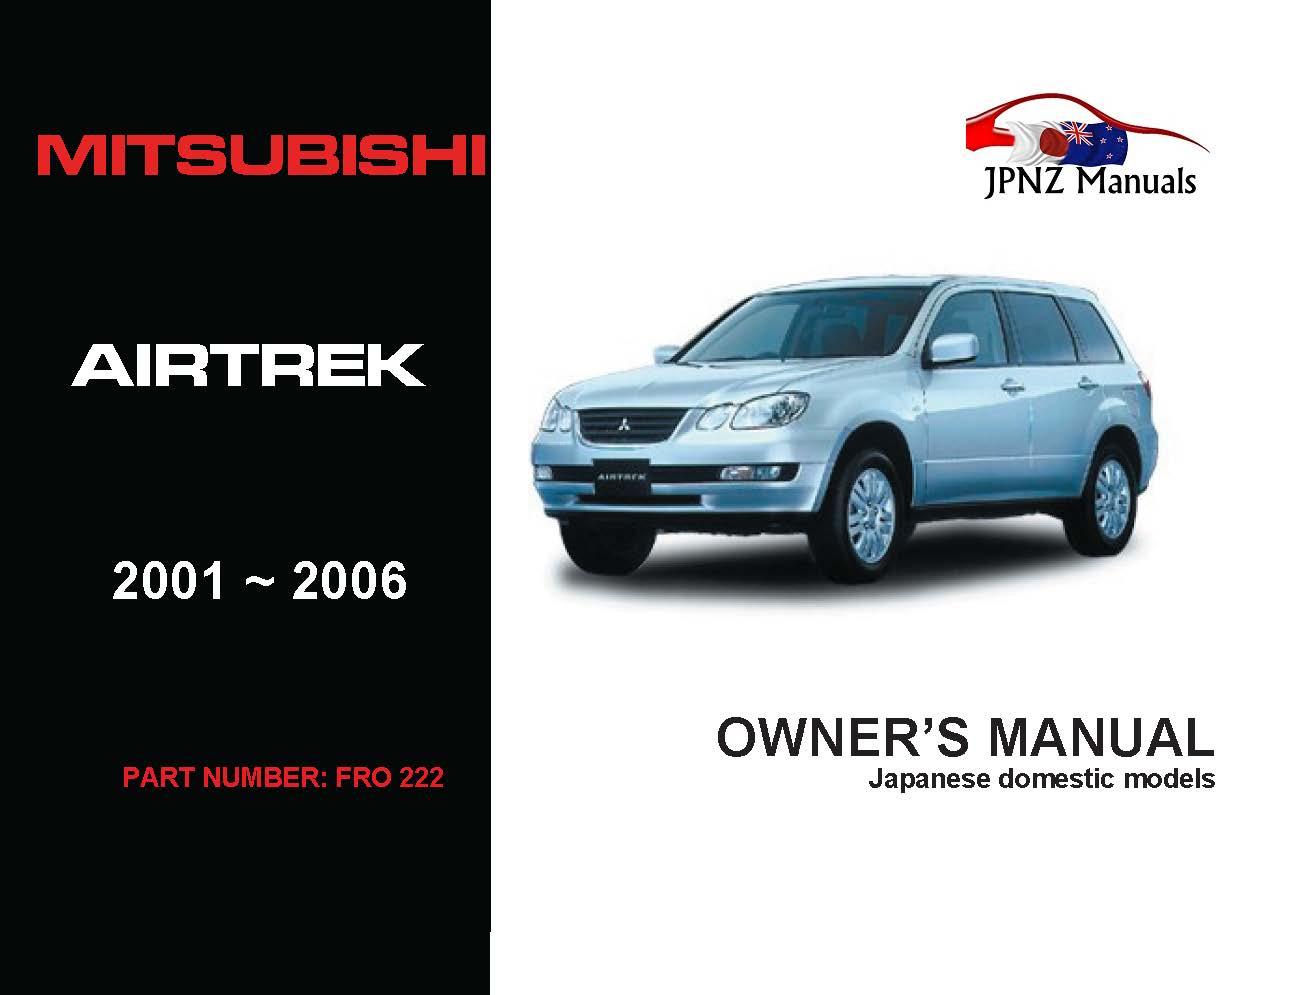 Mitsubishi - Airtrek Car Owners User Manual In English   2001 - 2006